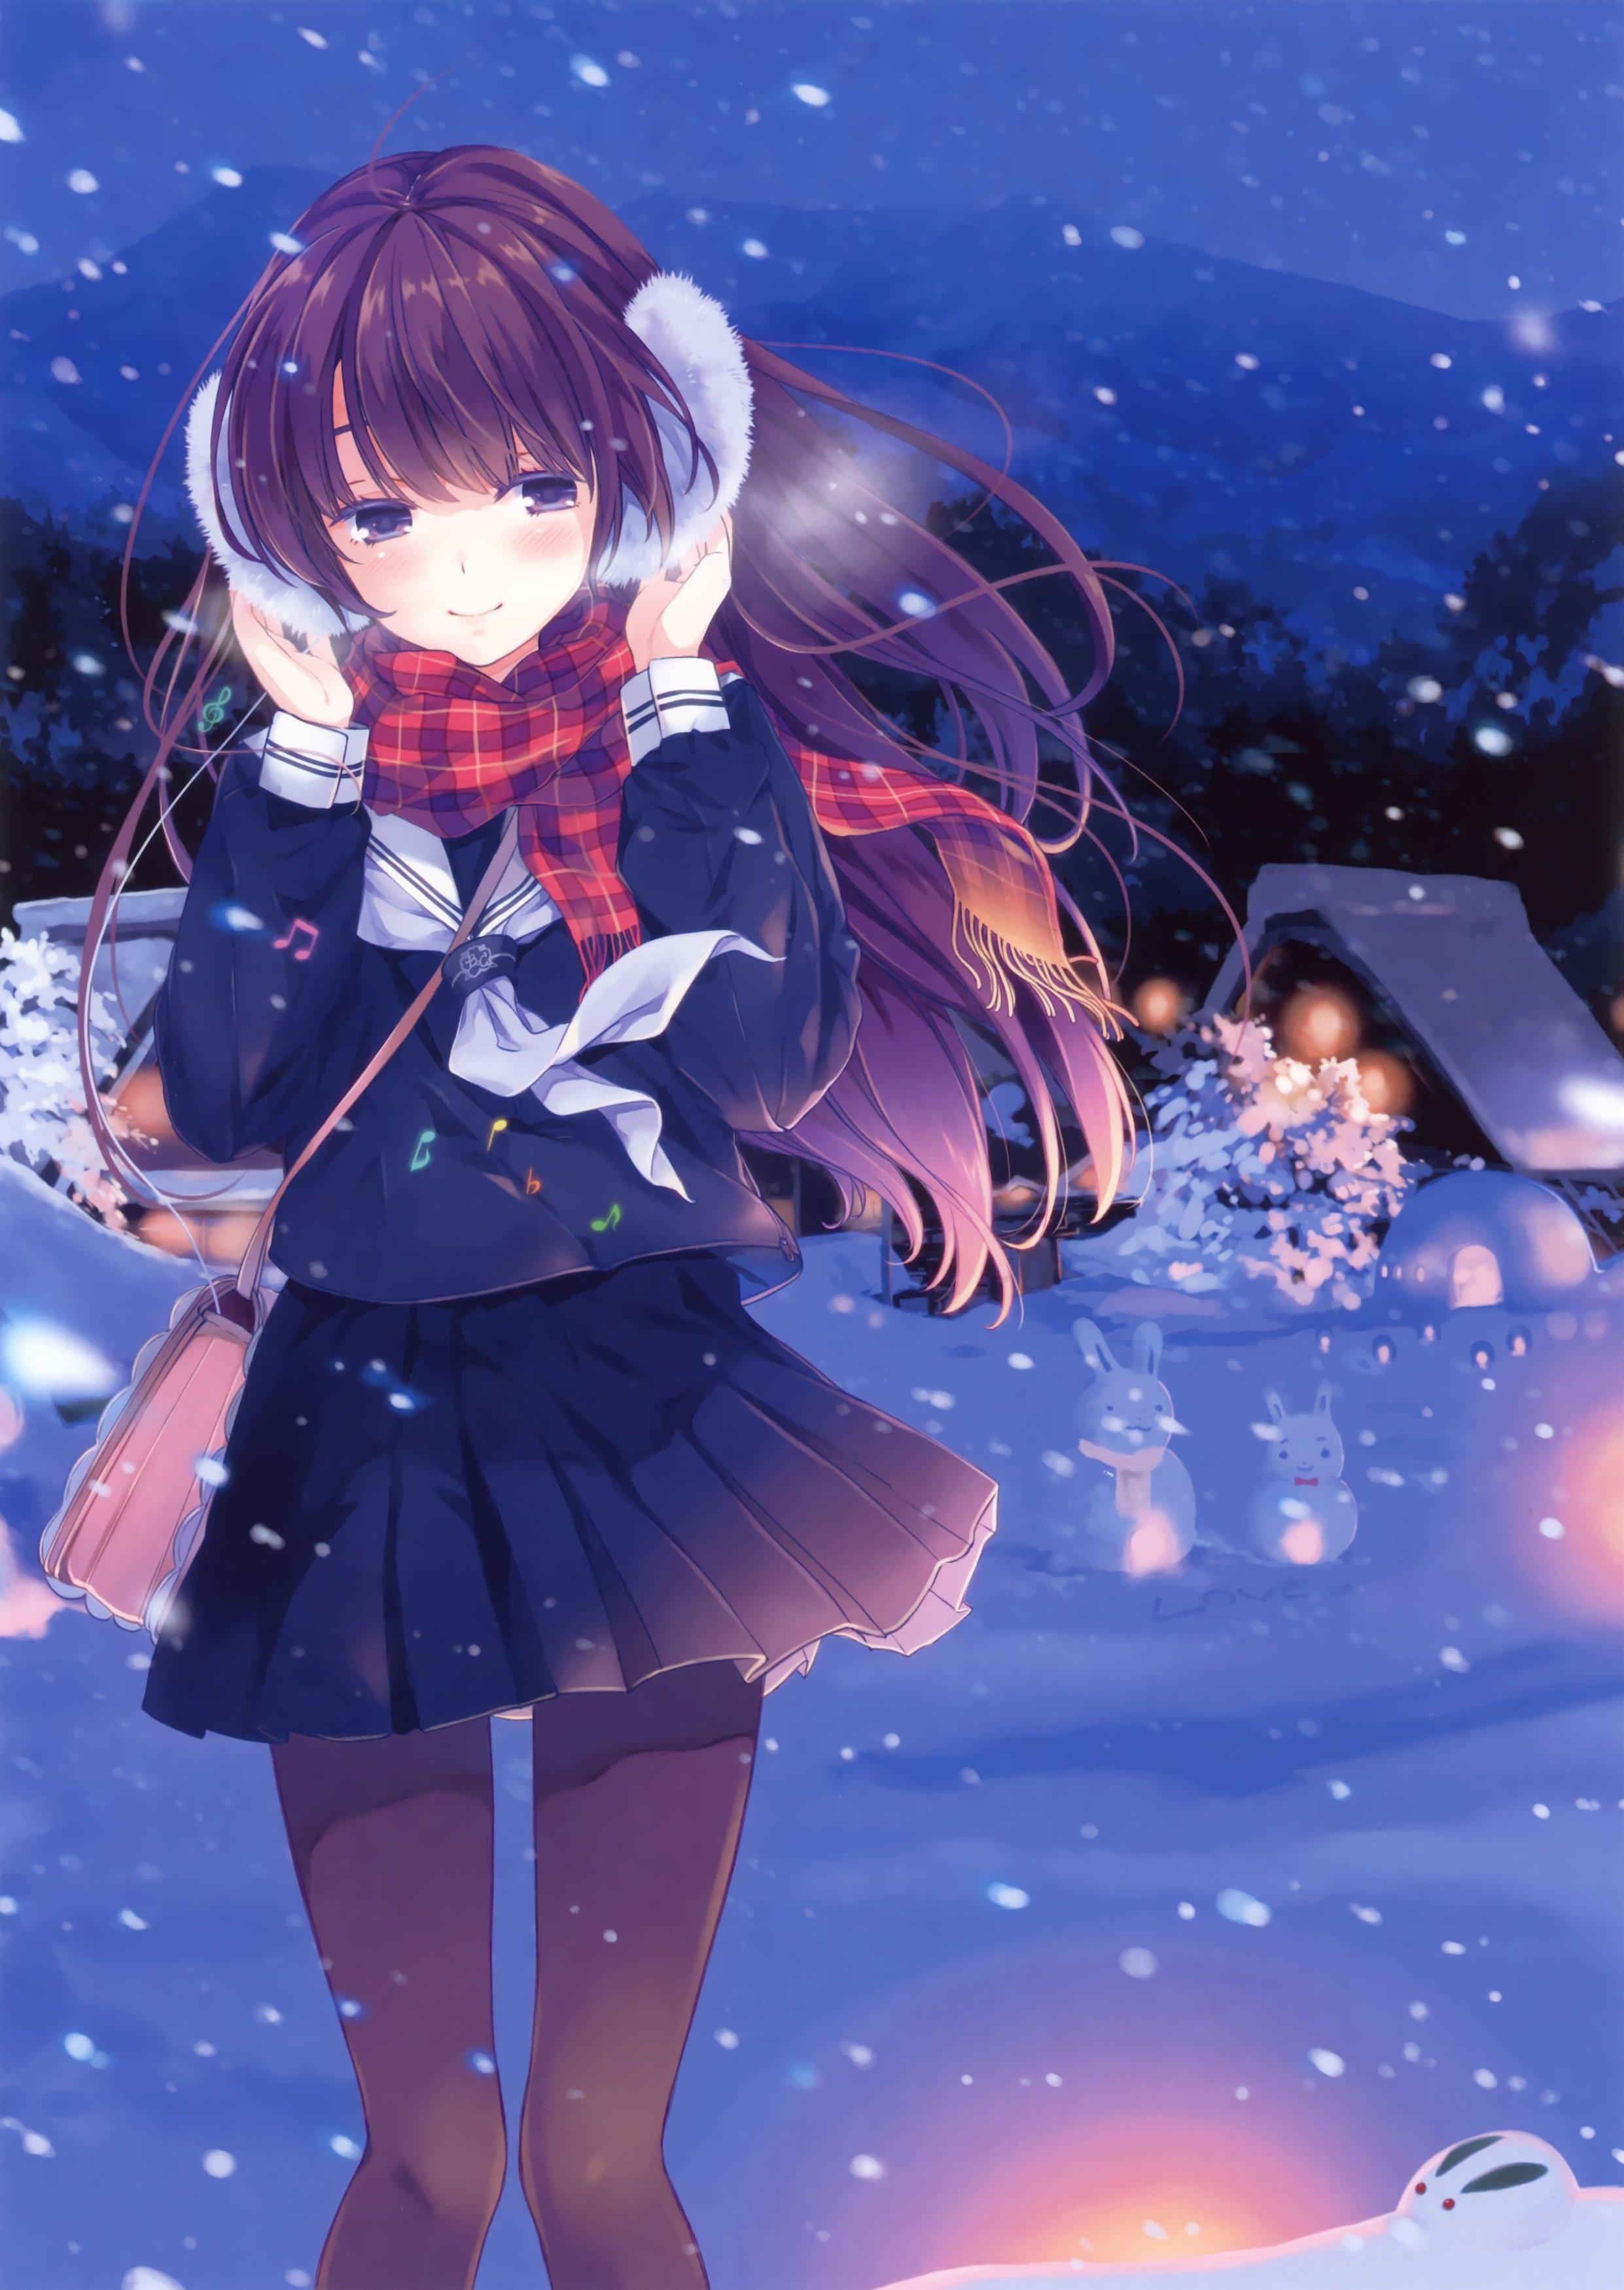 Original anime girl school uniform winter cute beautiful dress